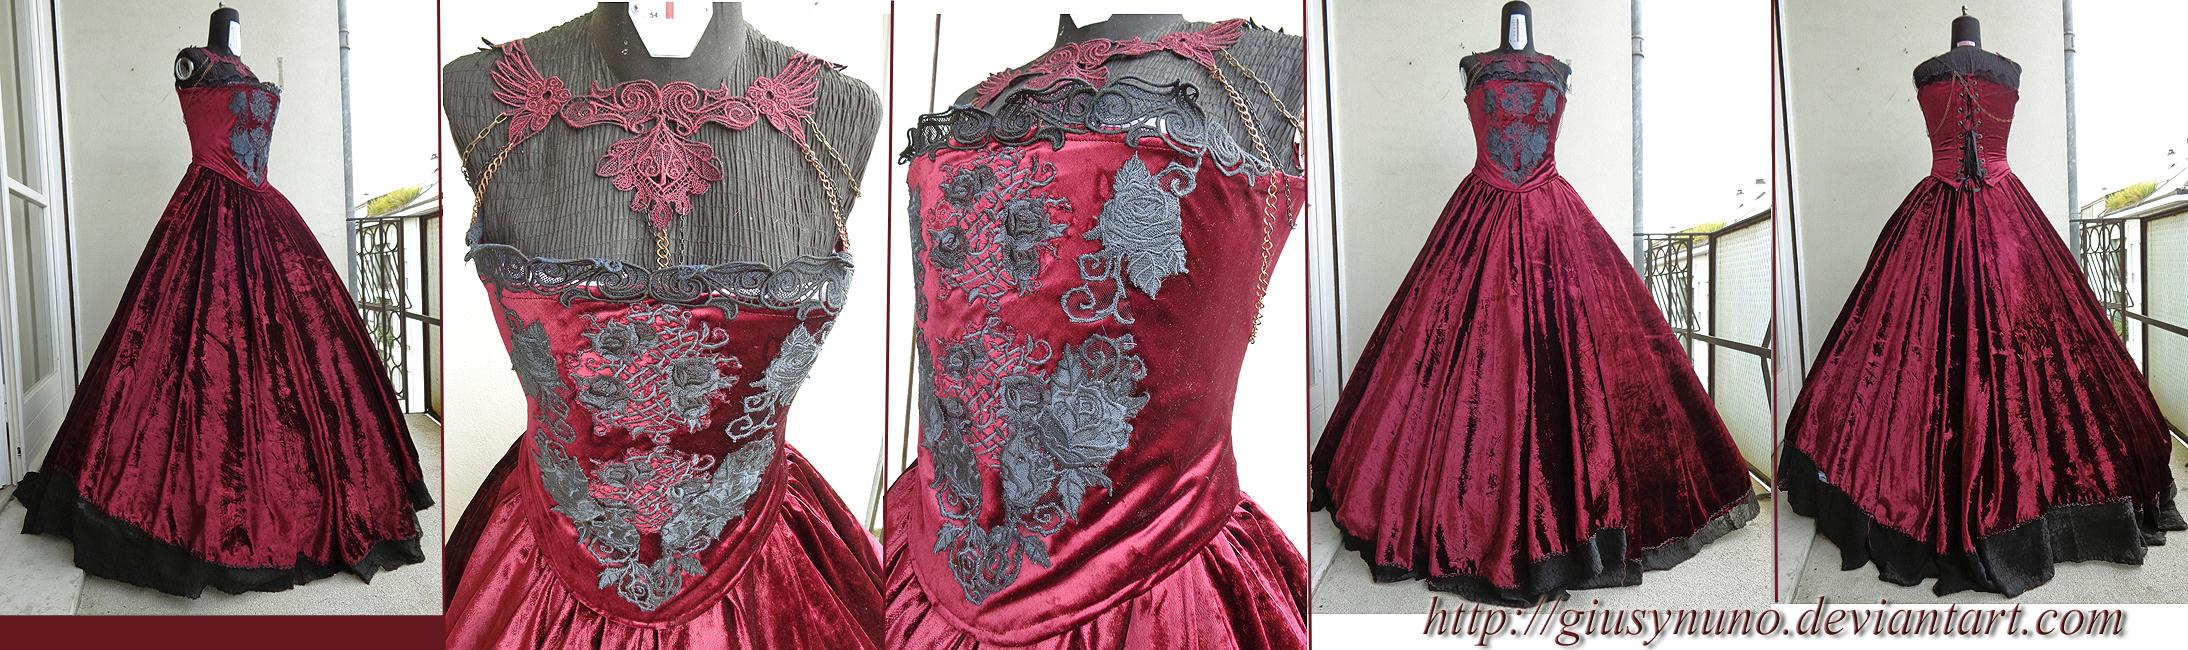 Burgundy 'Dark Rose' gothic dress by giusynuno